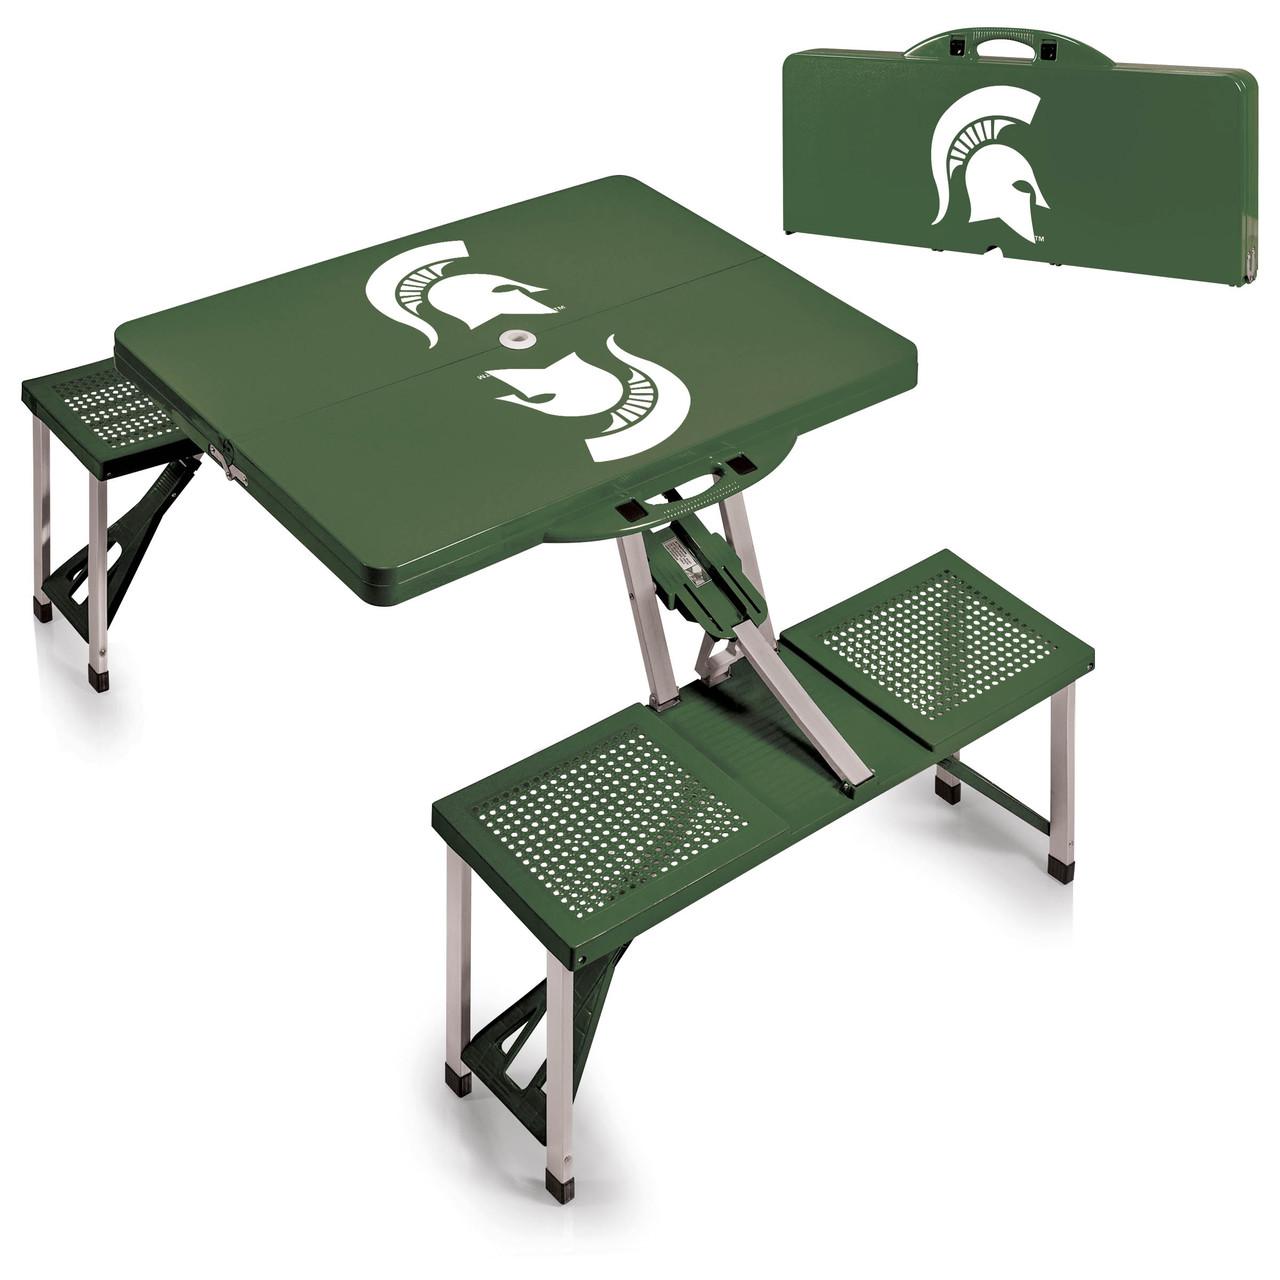 Picnic Table - Michigan State